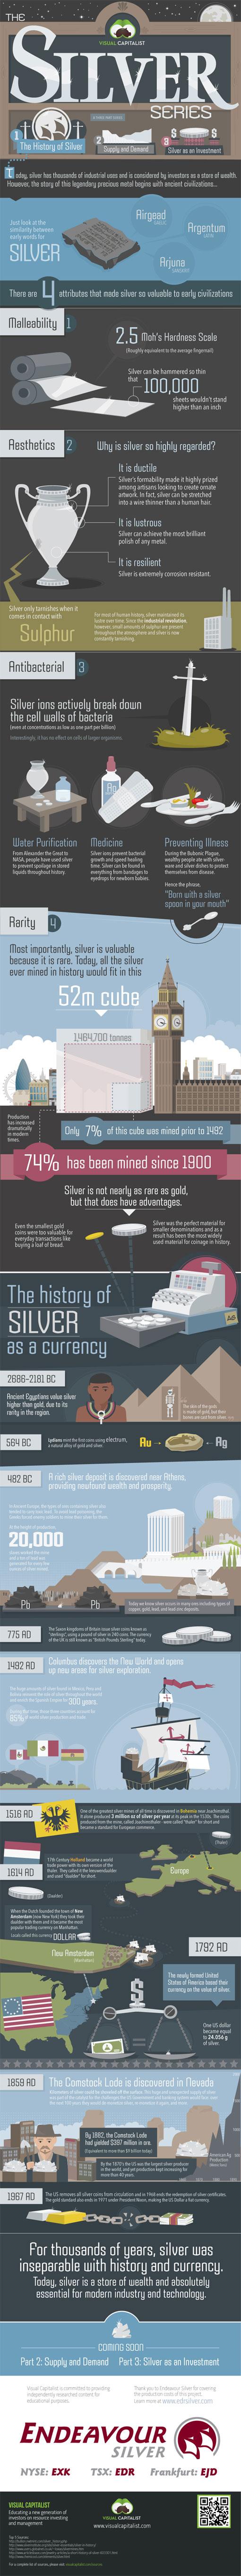 Historia-Srebra-Srebro-jako-waluta-Infografika